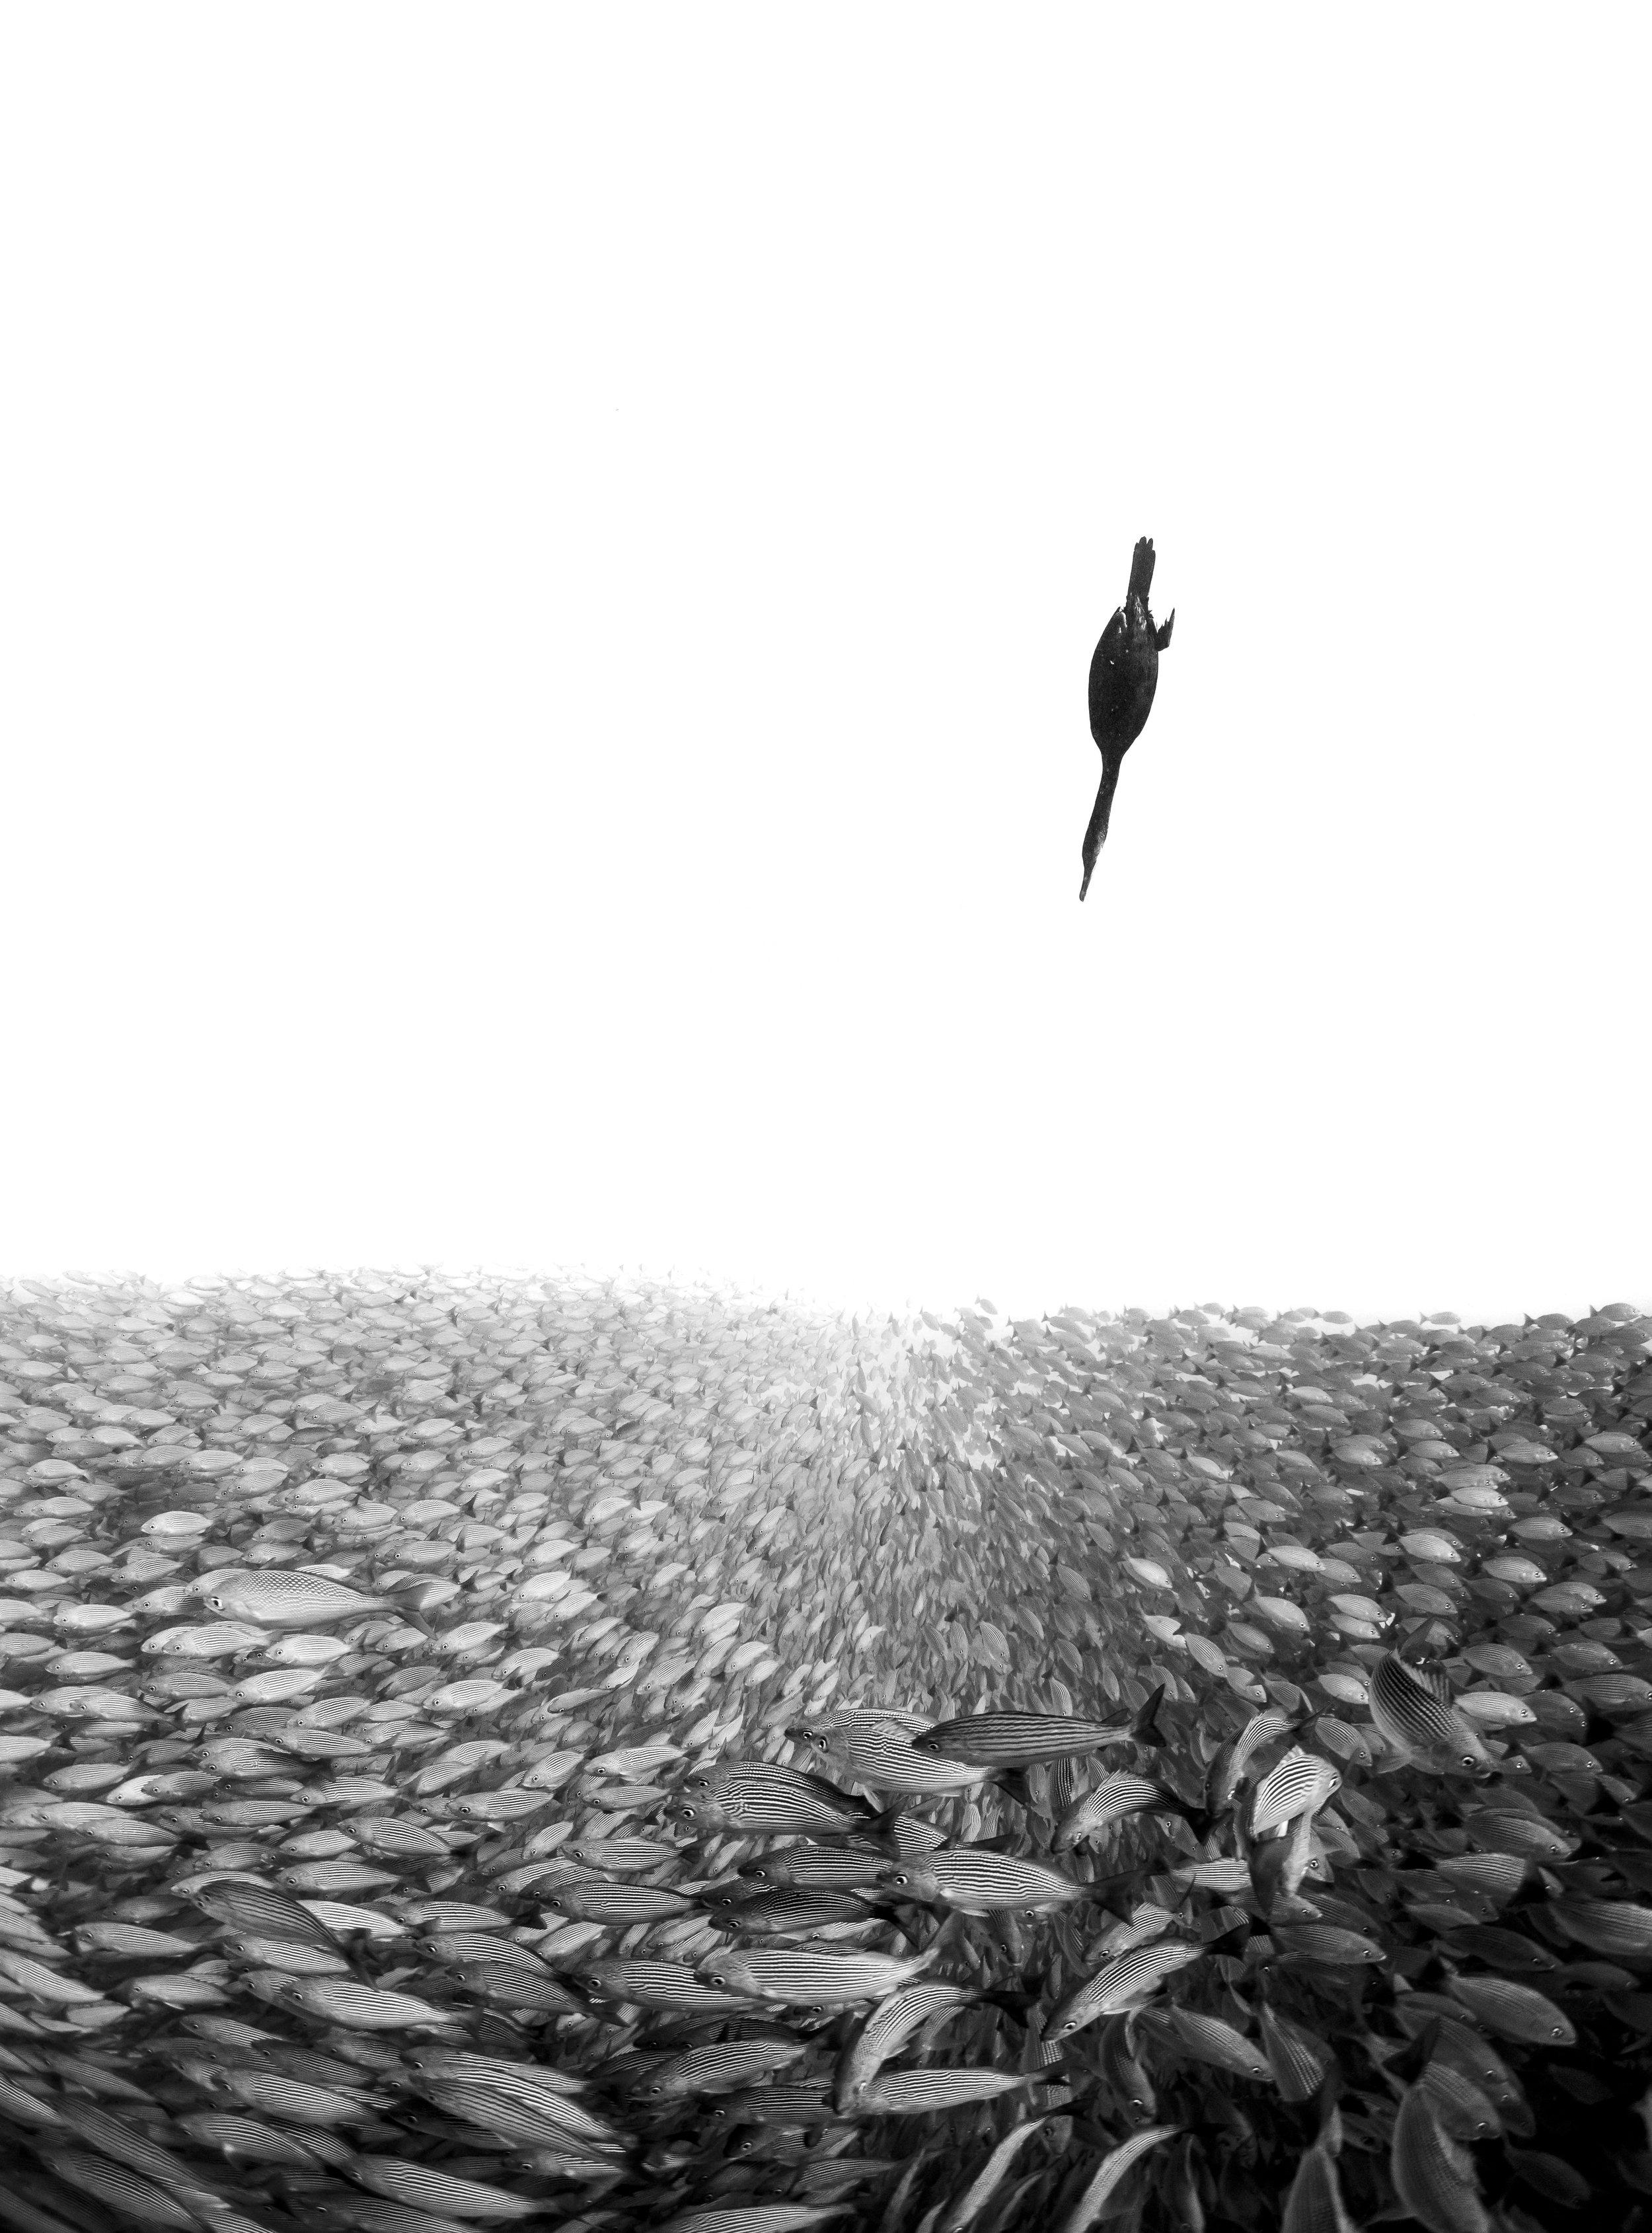 Between Two Worlds ©Henley Spiers/UPY2019